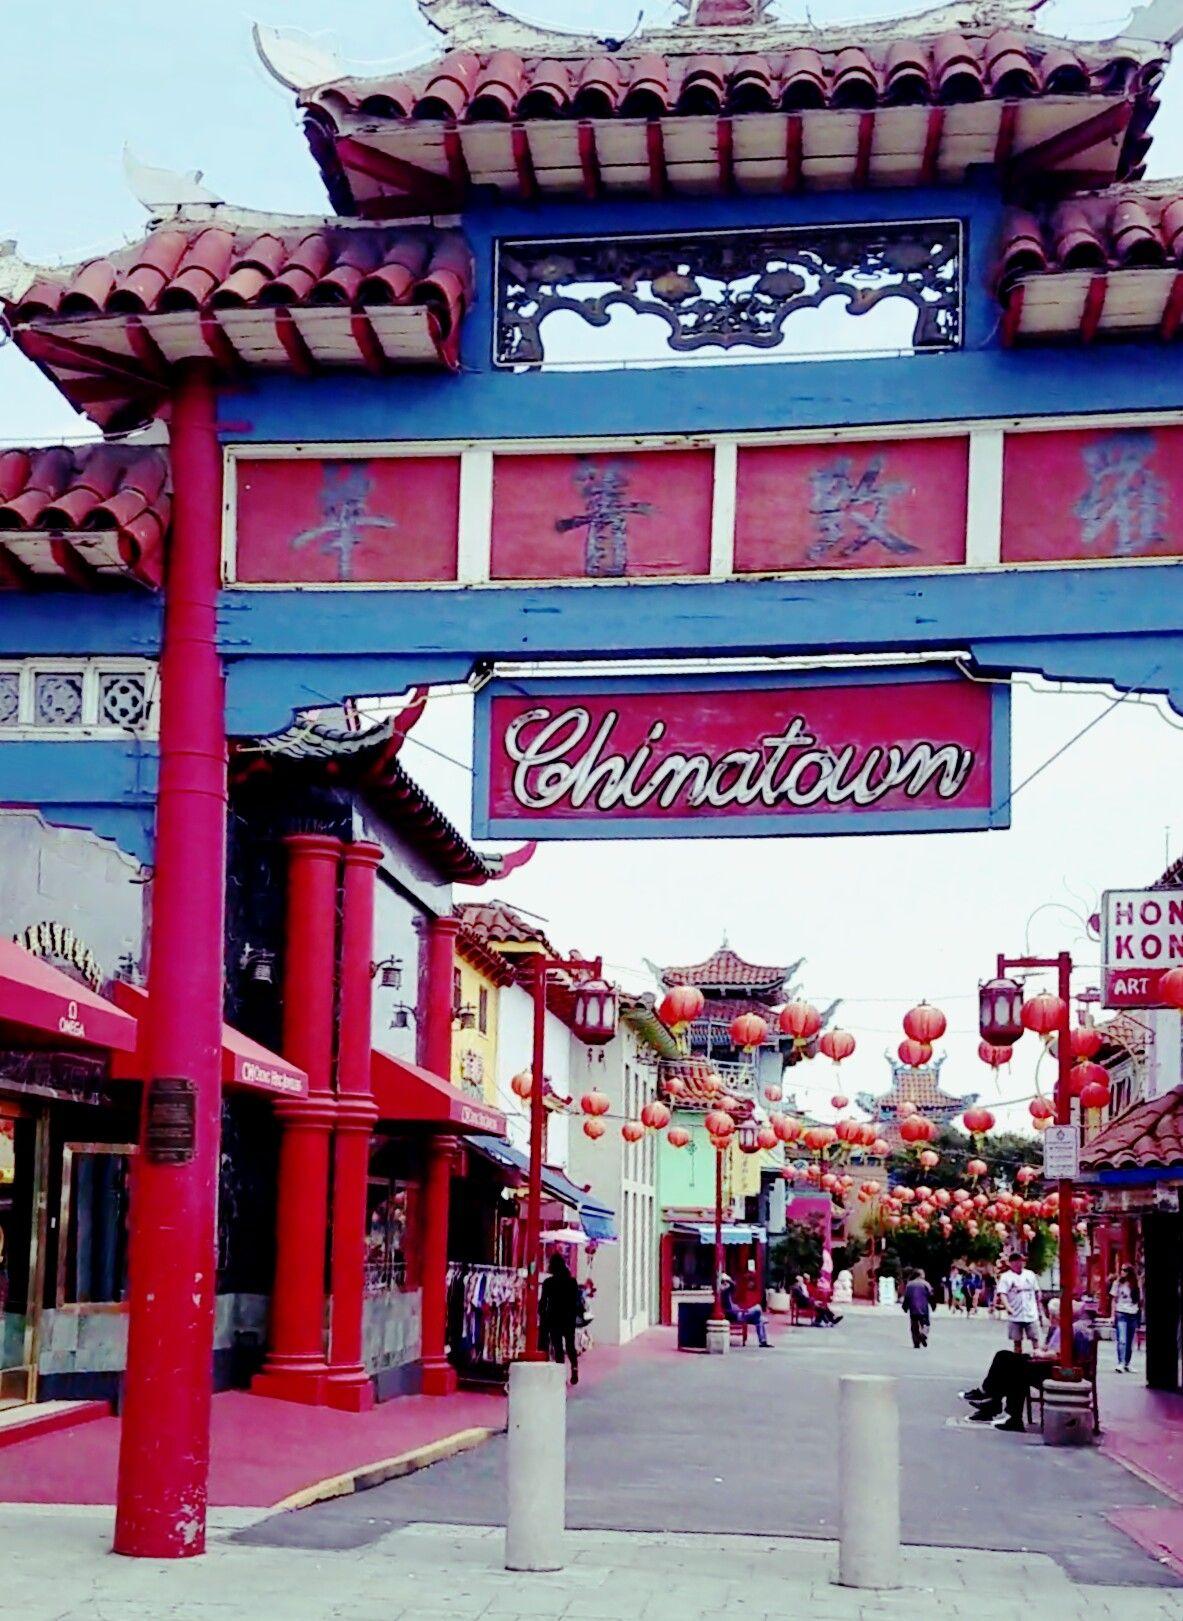 db8a0350187 Chinatown